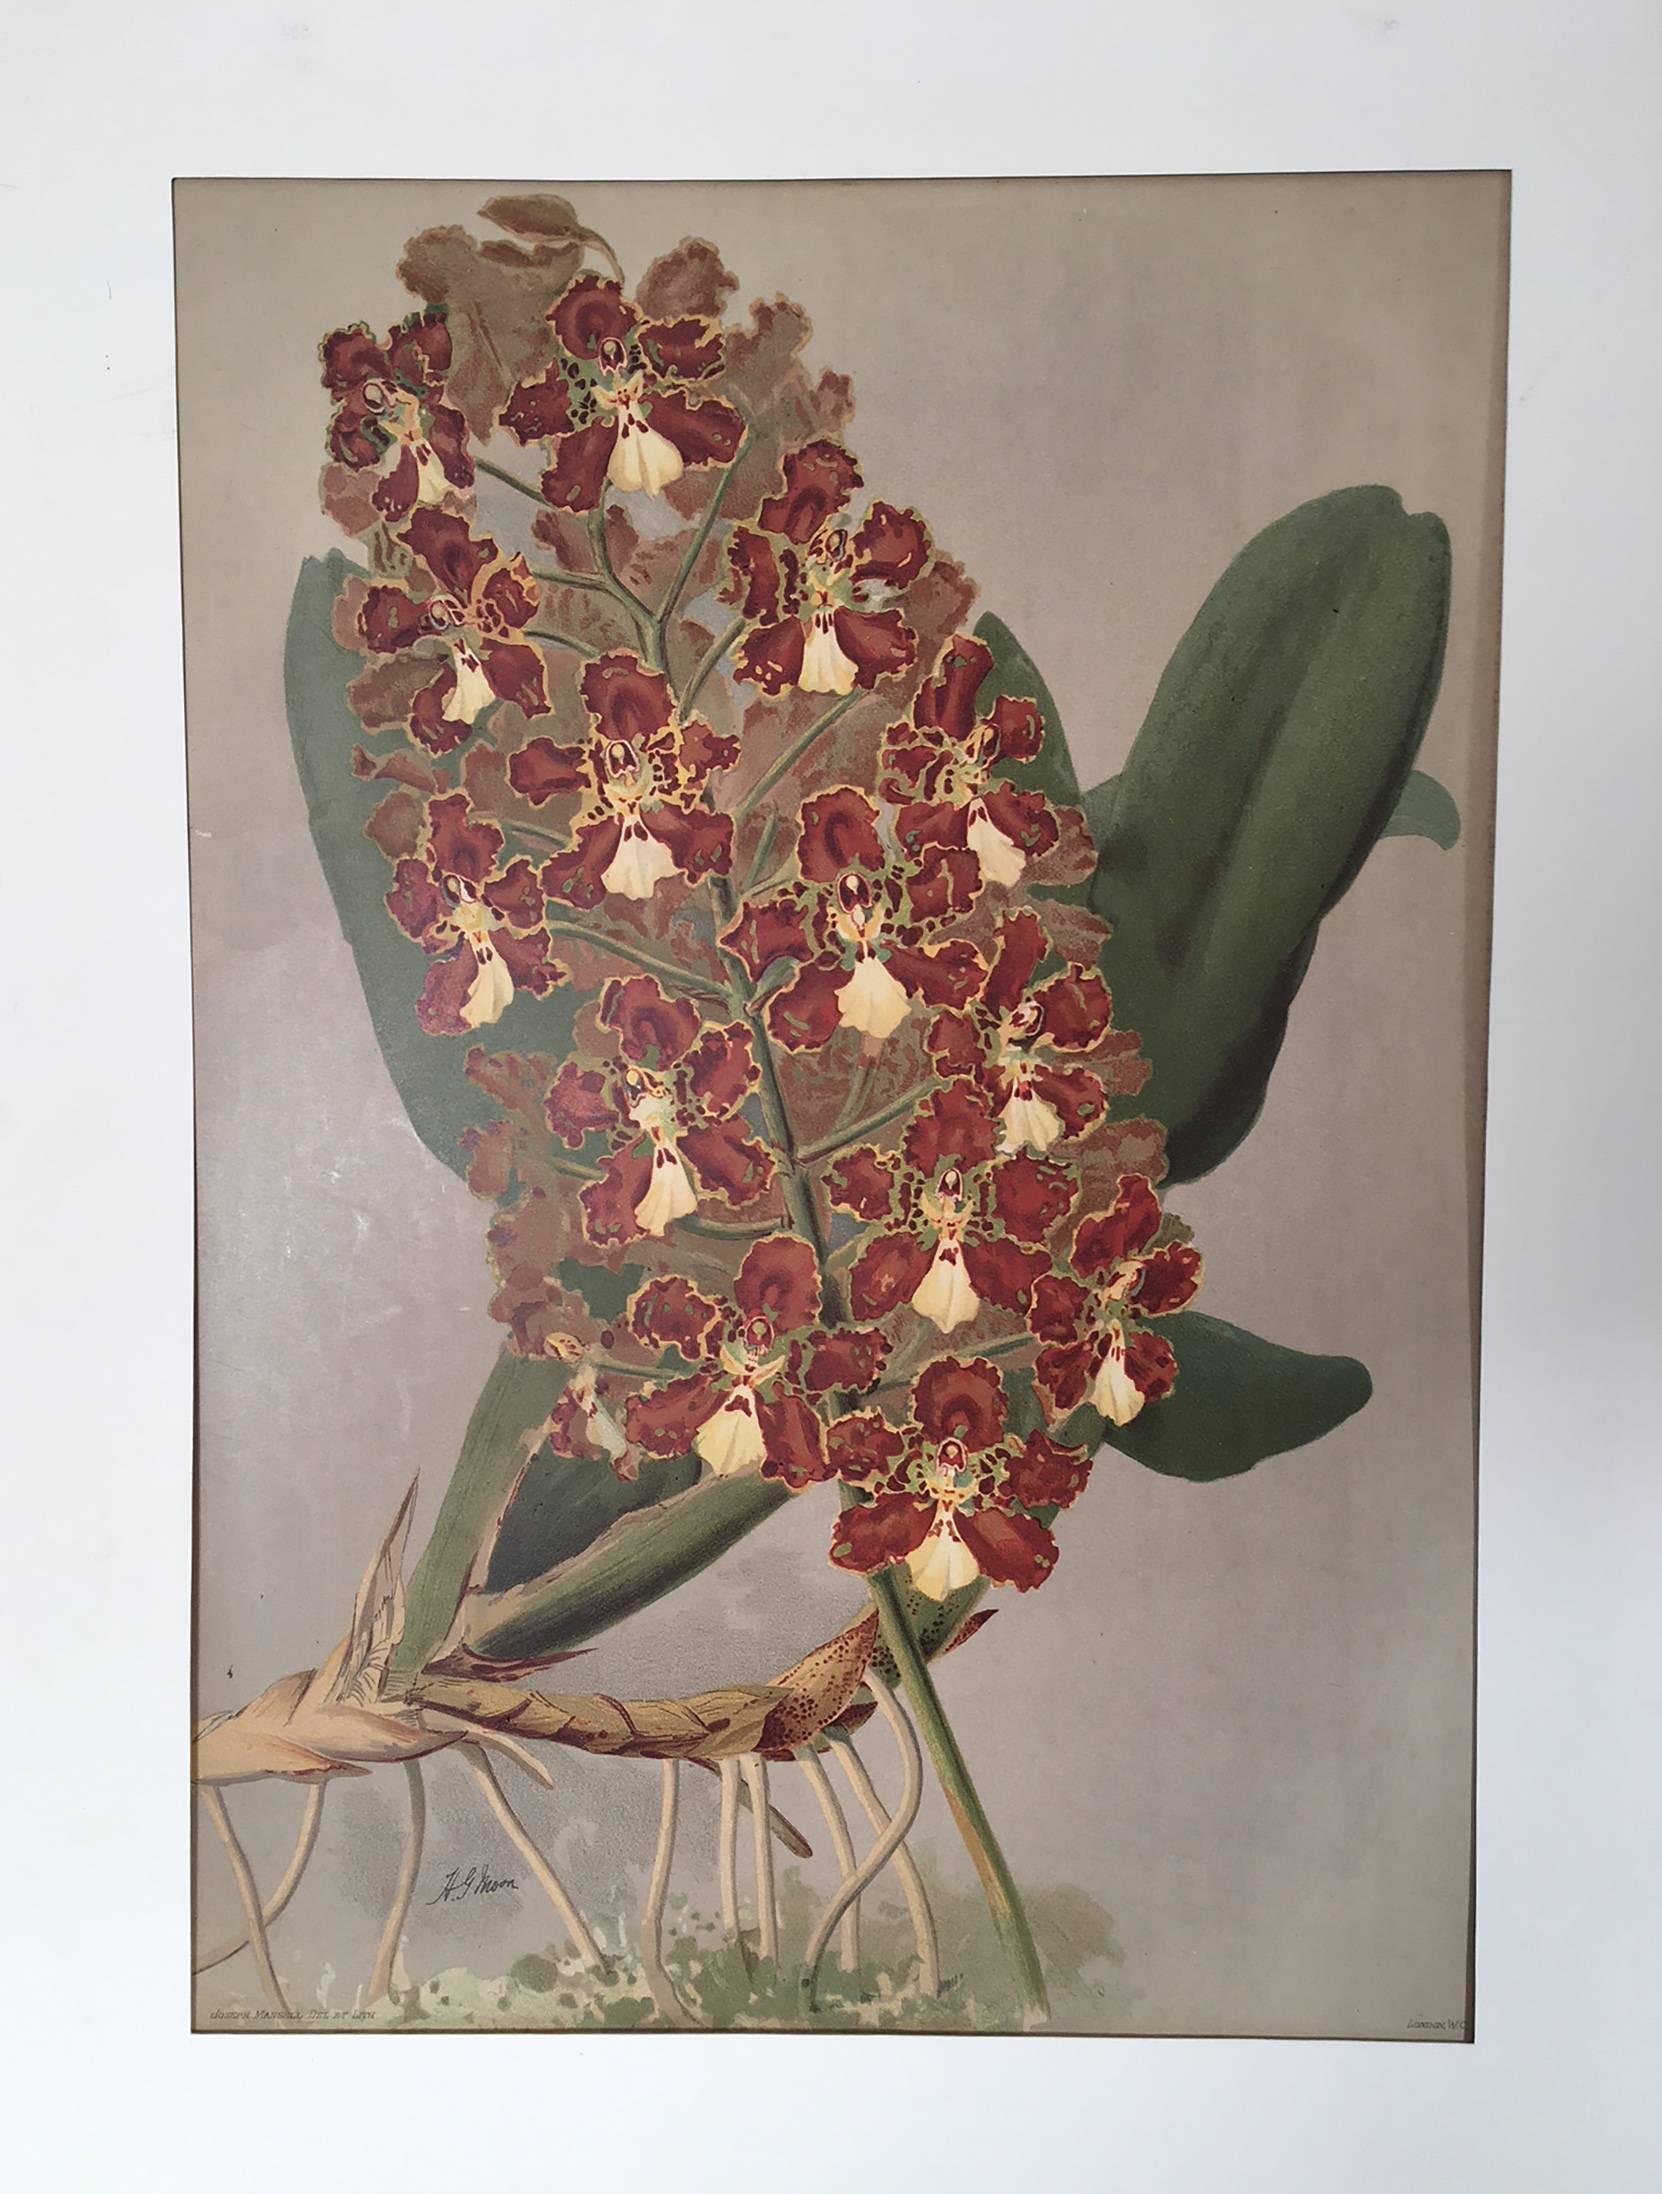 The Orchid Odontoglossum